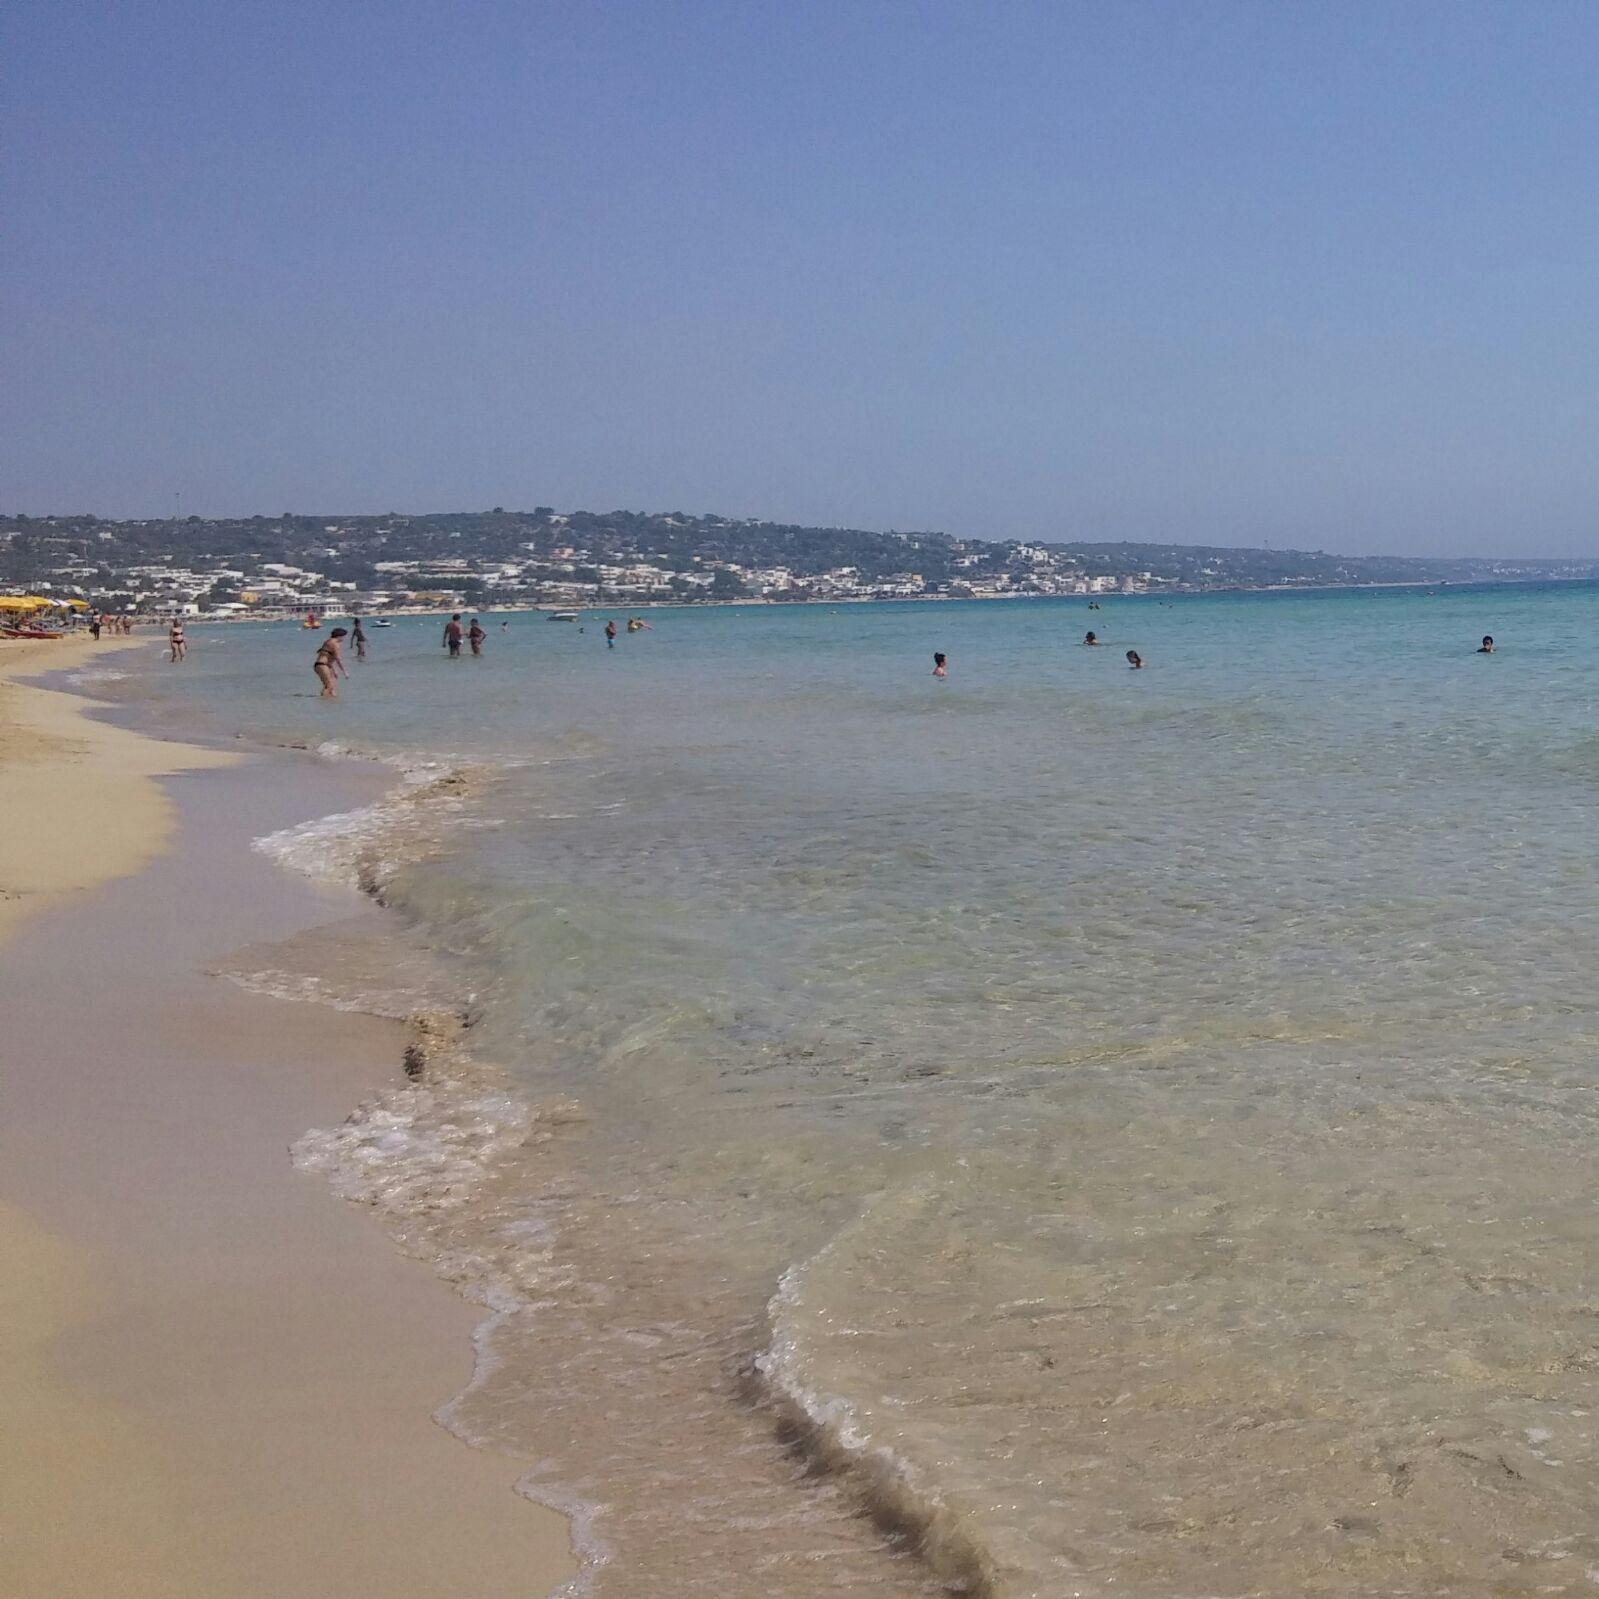 spiagge salentine 3 (matilda qose)